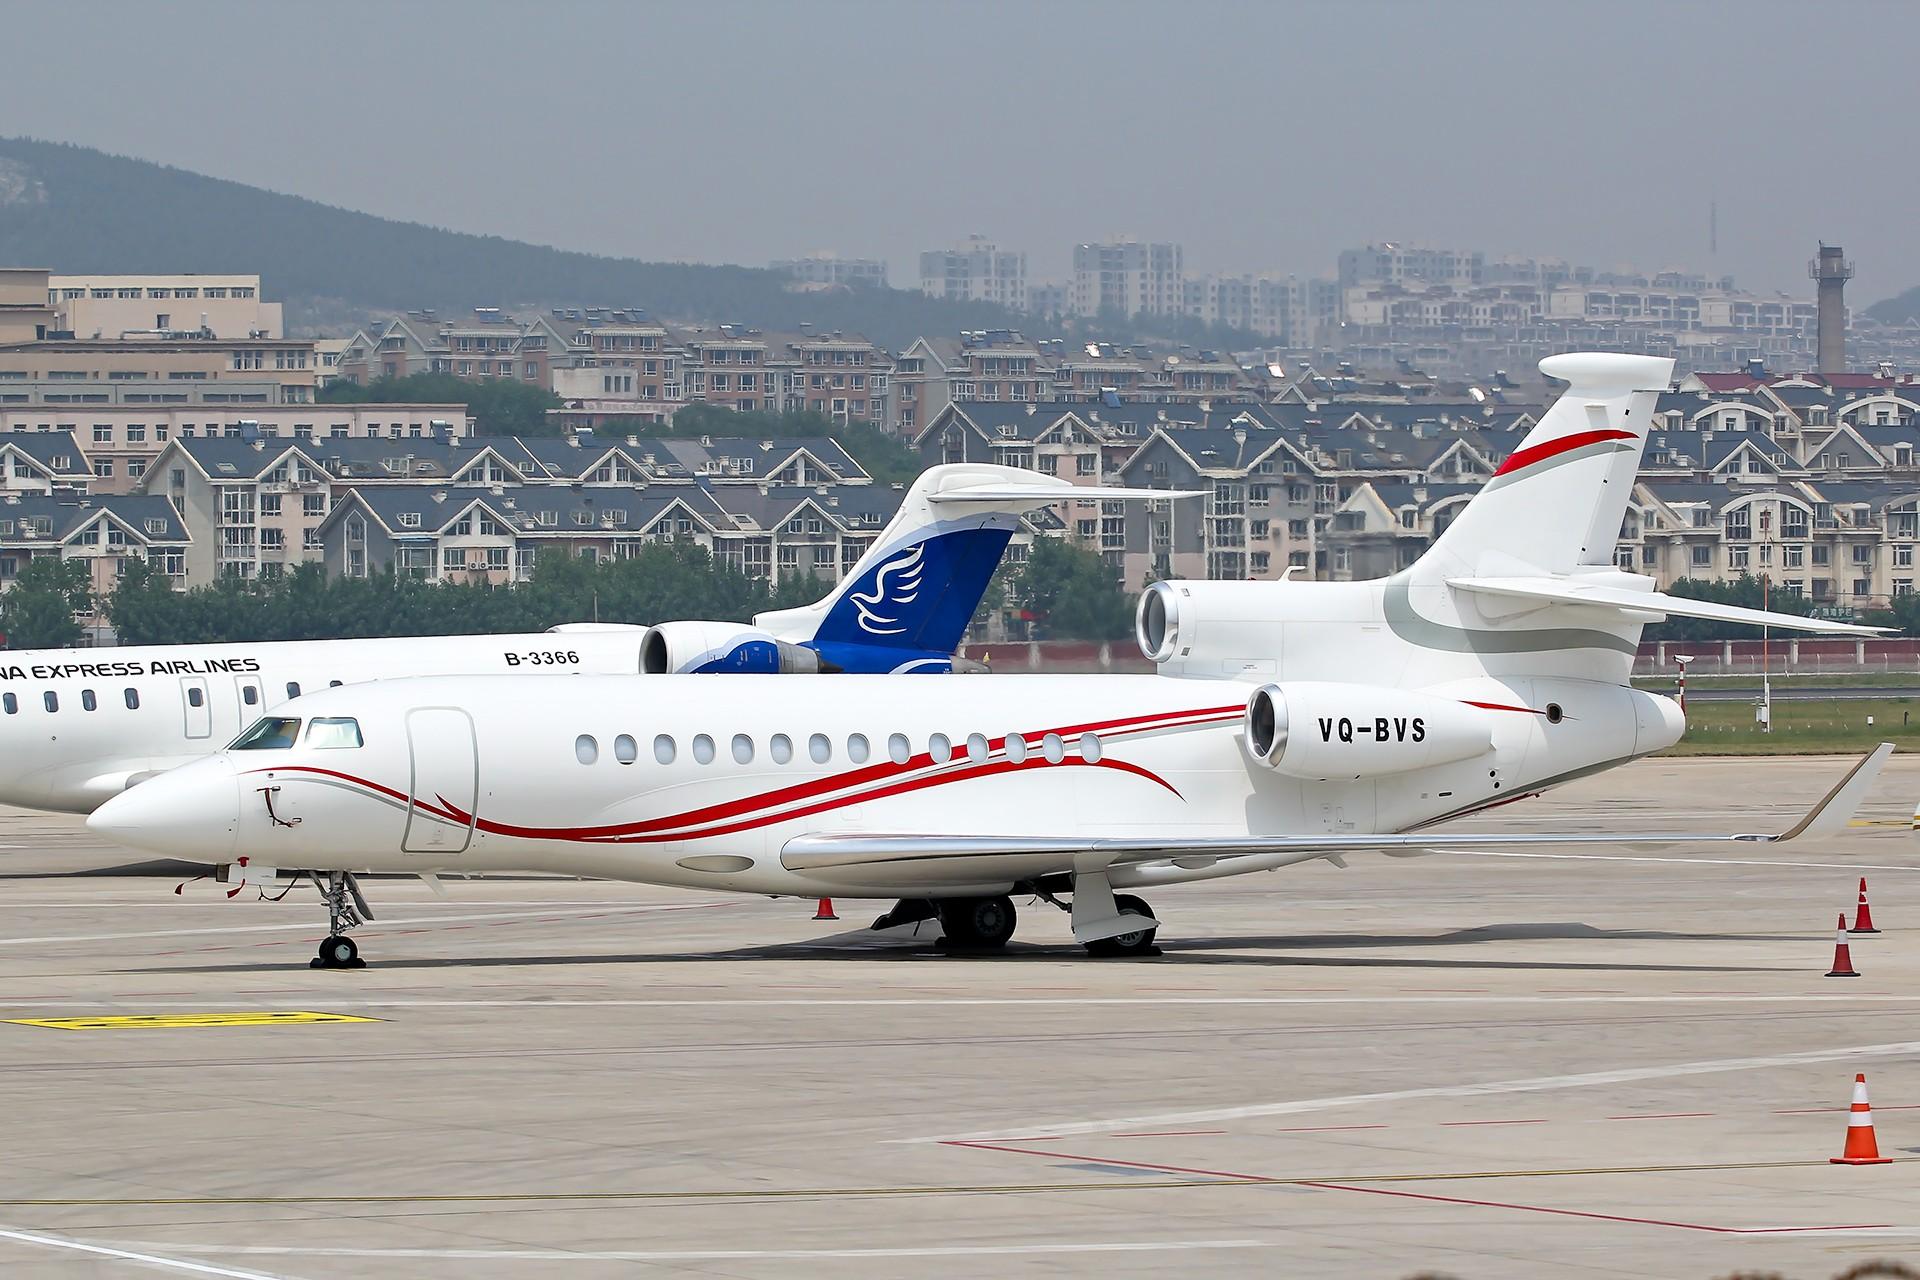 Re:[原创]Dassault Falcon 7X DASSAULT FALCON 7X VQ-BVS 中国大连周水子国际机场